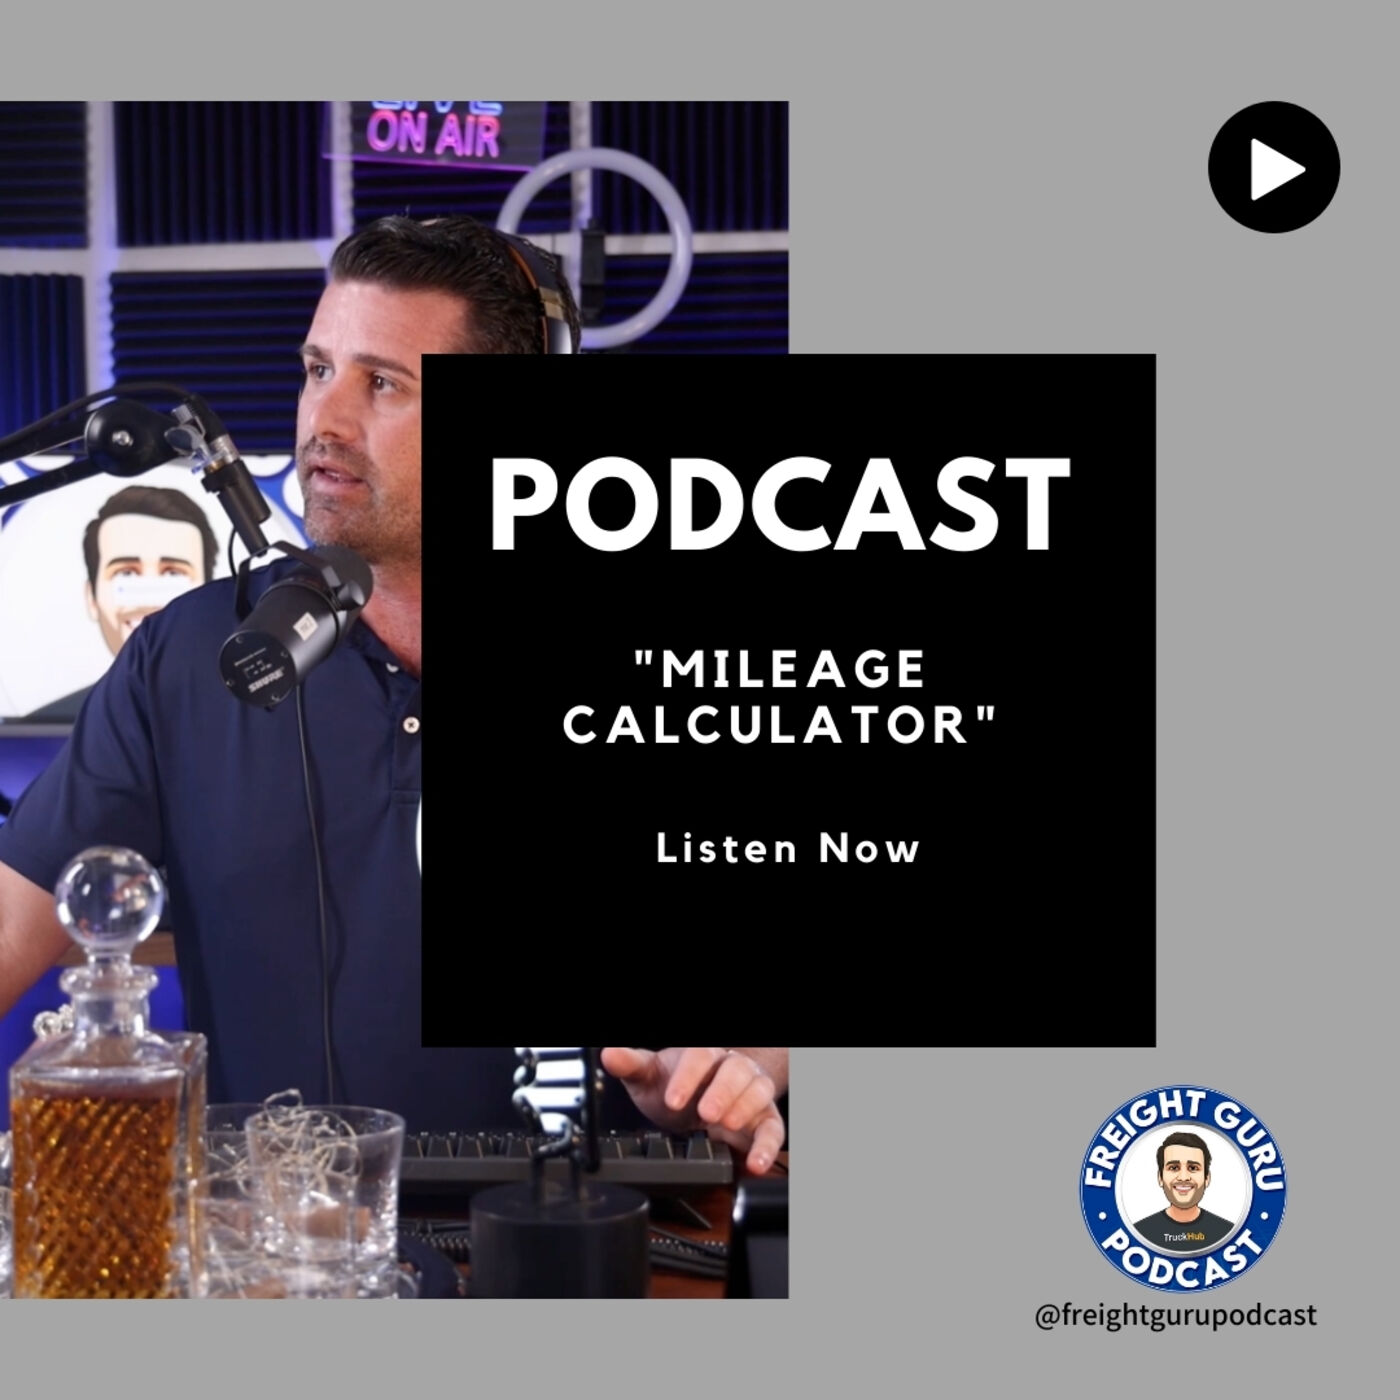 Mileage Calculator - The Freight Guru Podcast Ep. 13